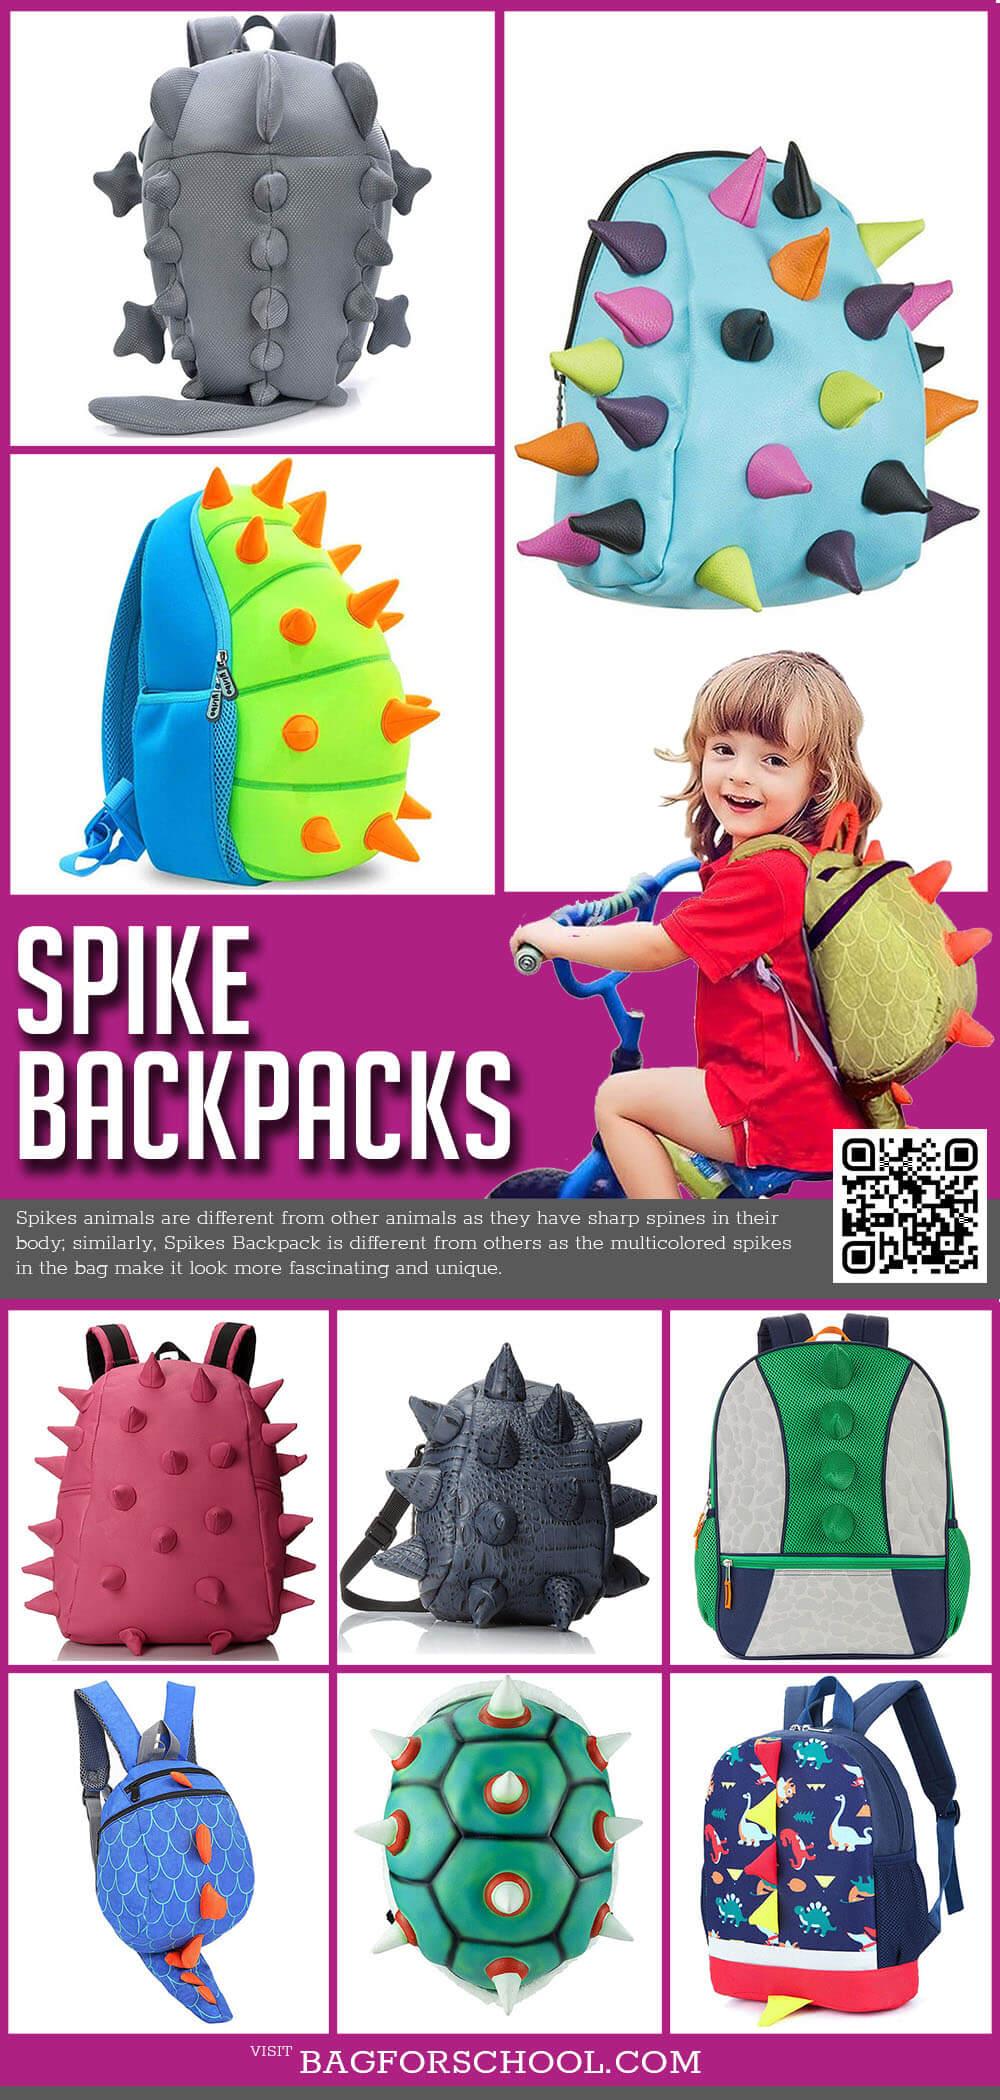 Spike Backpacks